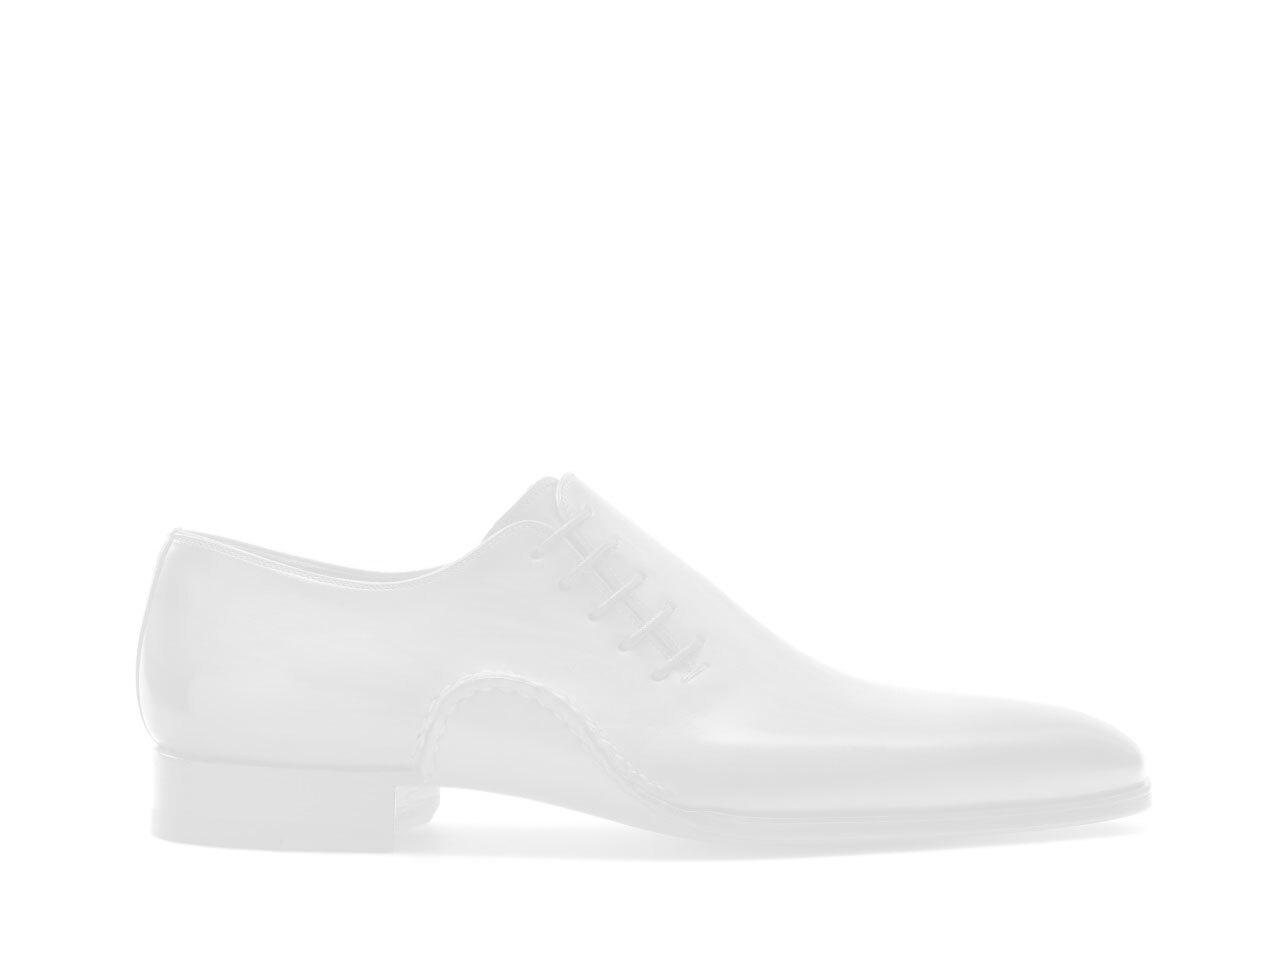 Cognac brown loafer leather shoes for men - Magnanni